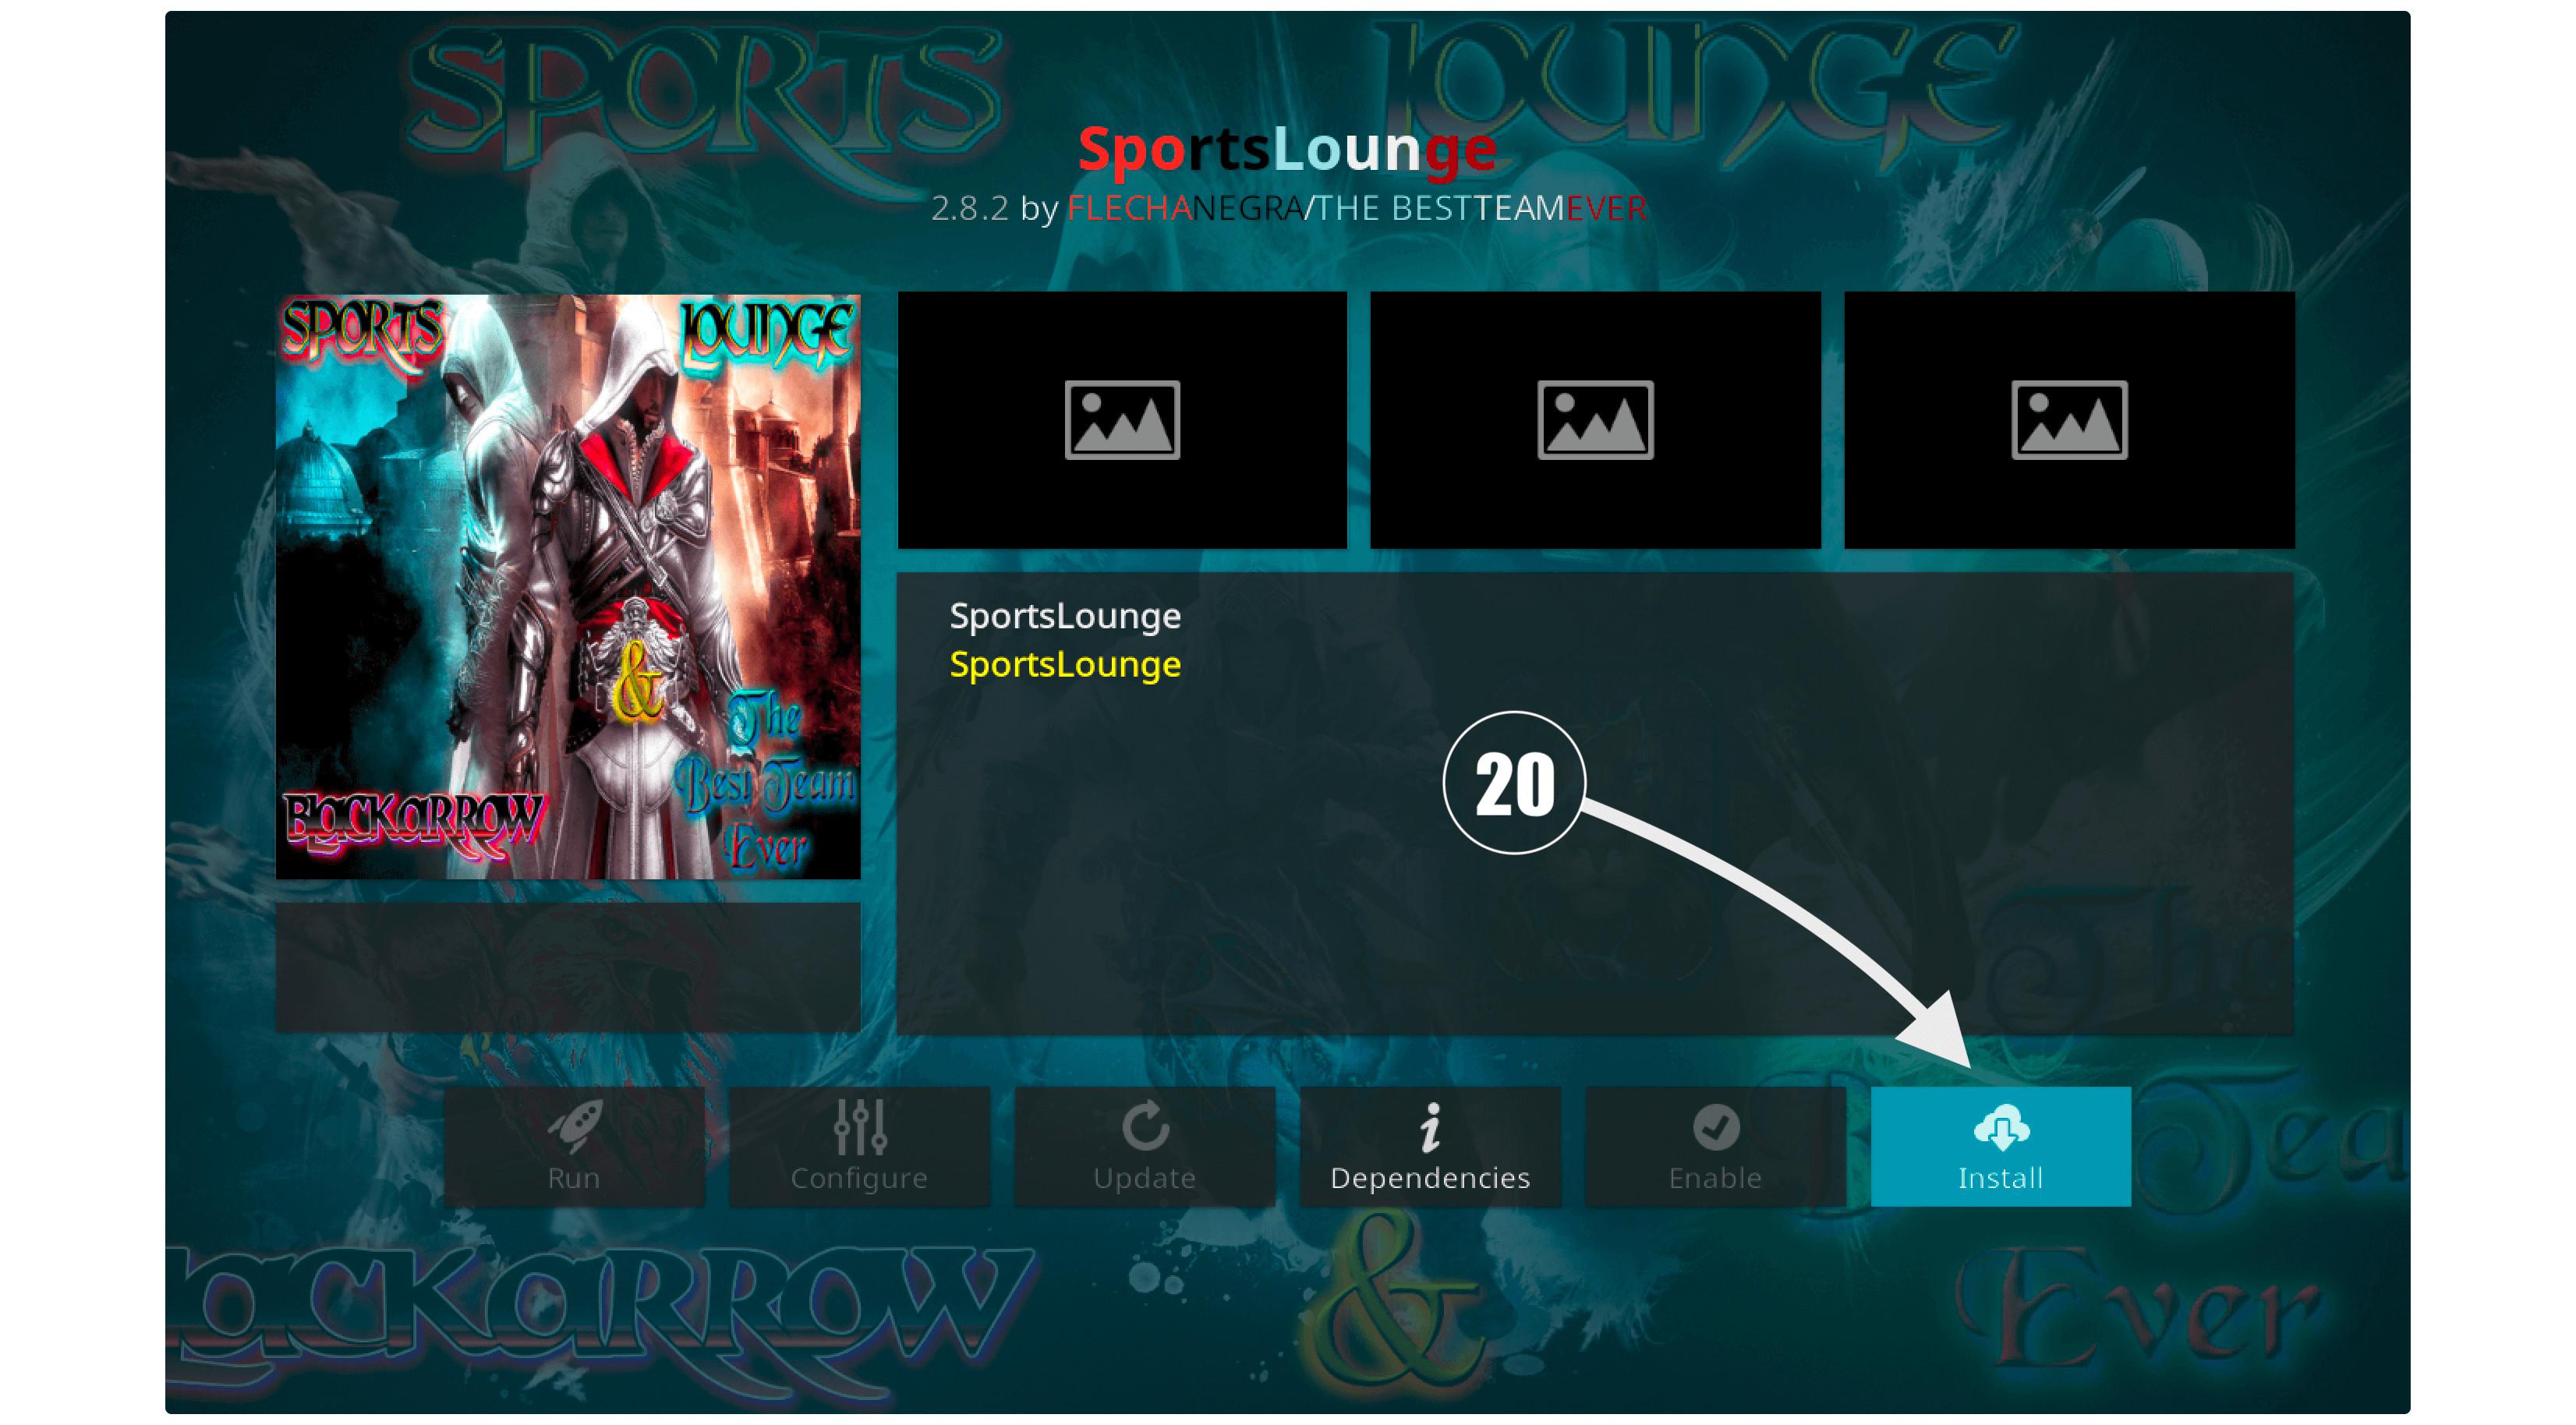 Install-Live-Sports-On-fireTv-Stick